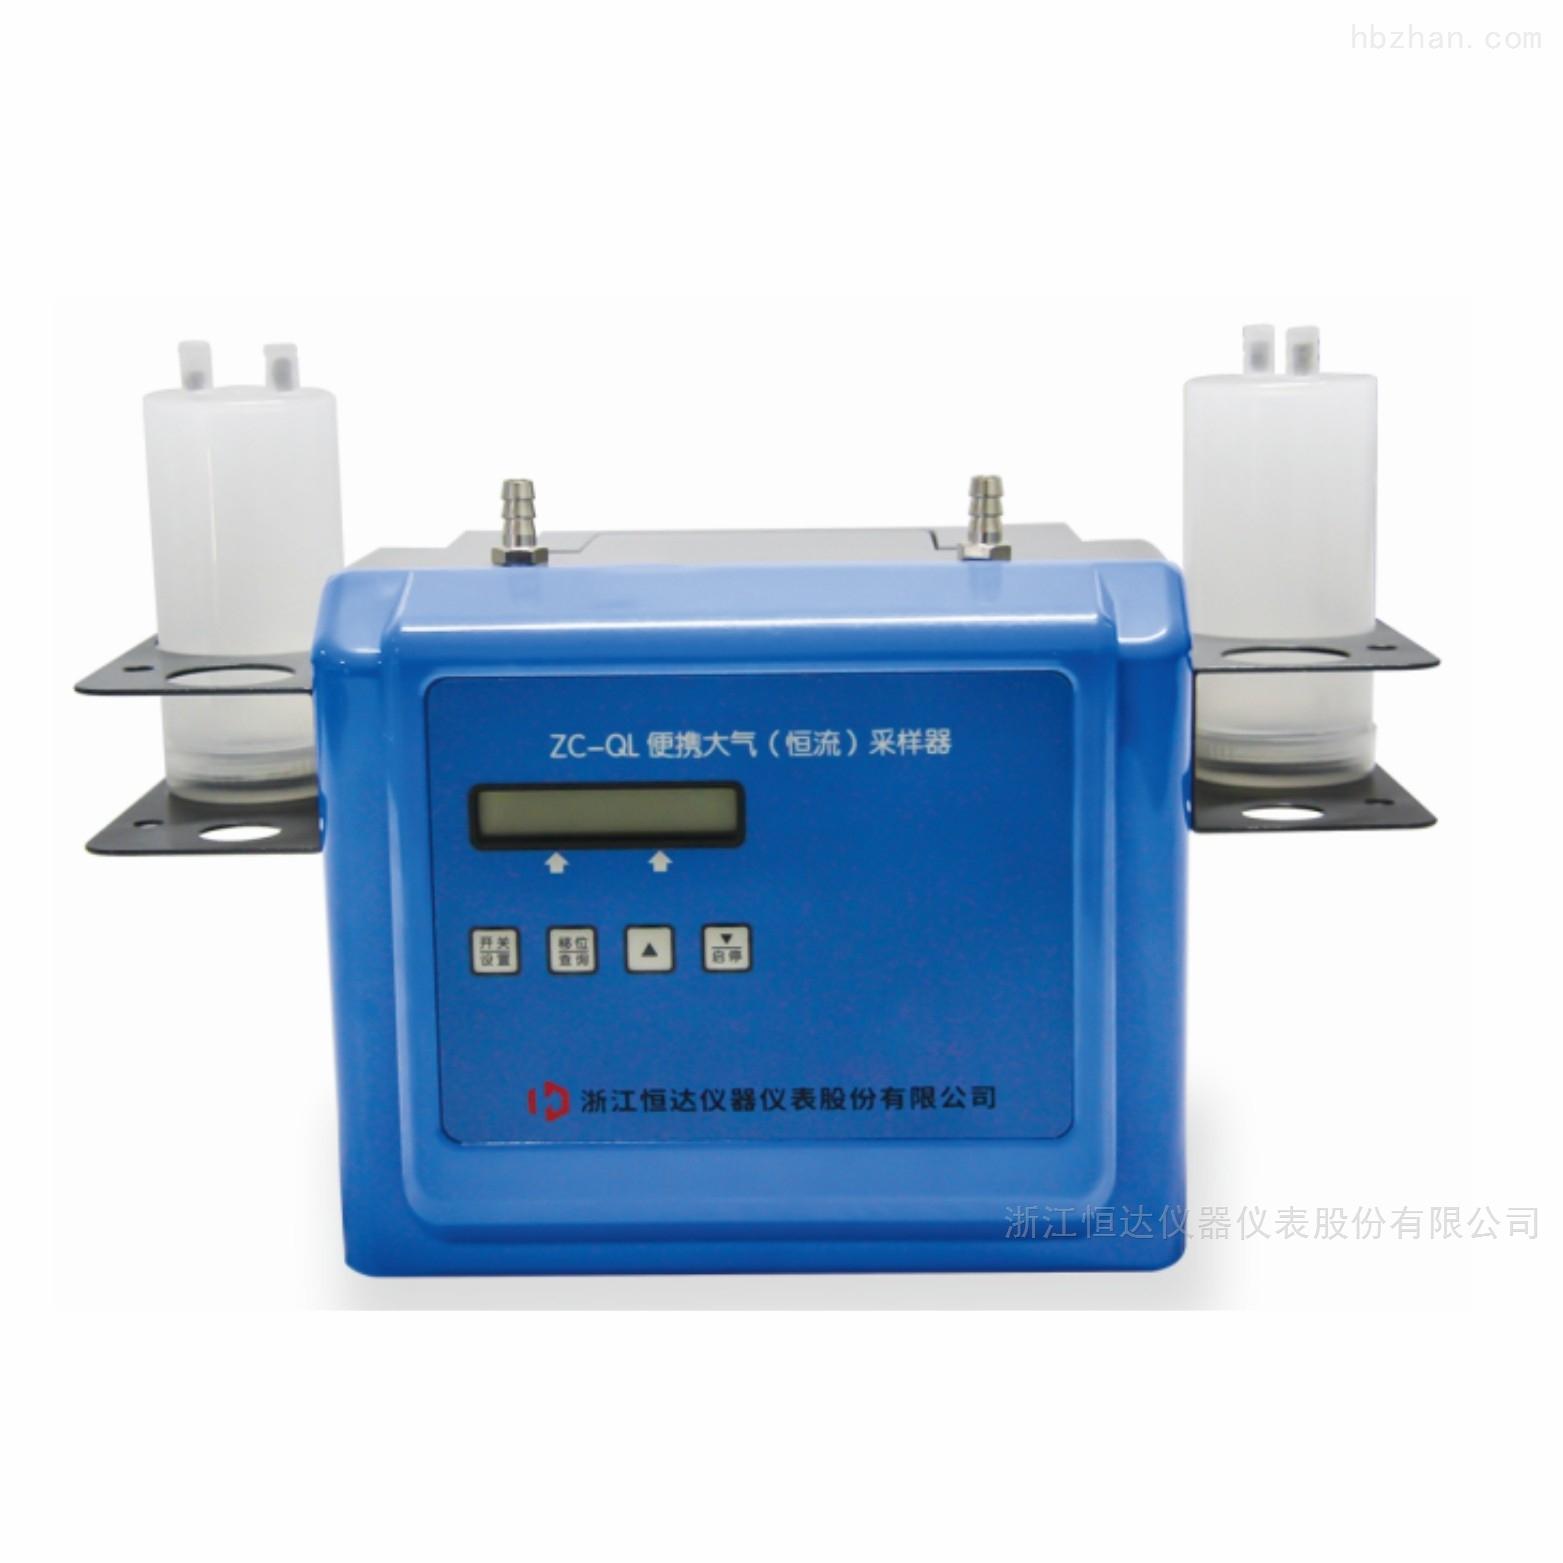 ZC-QL便携大气采样器(恒流)